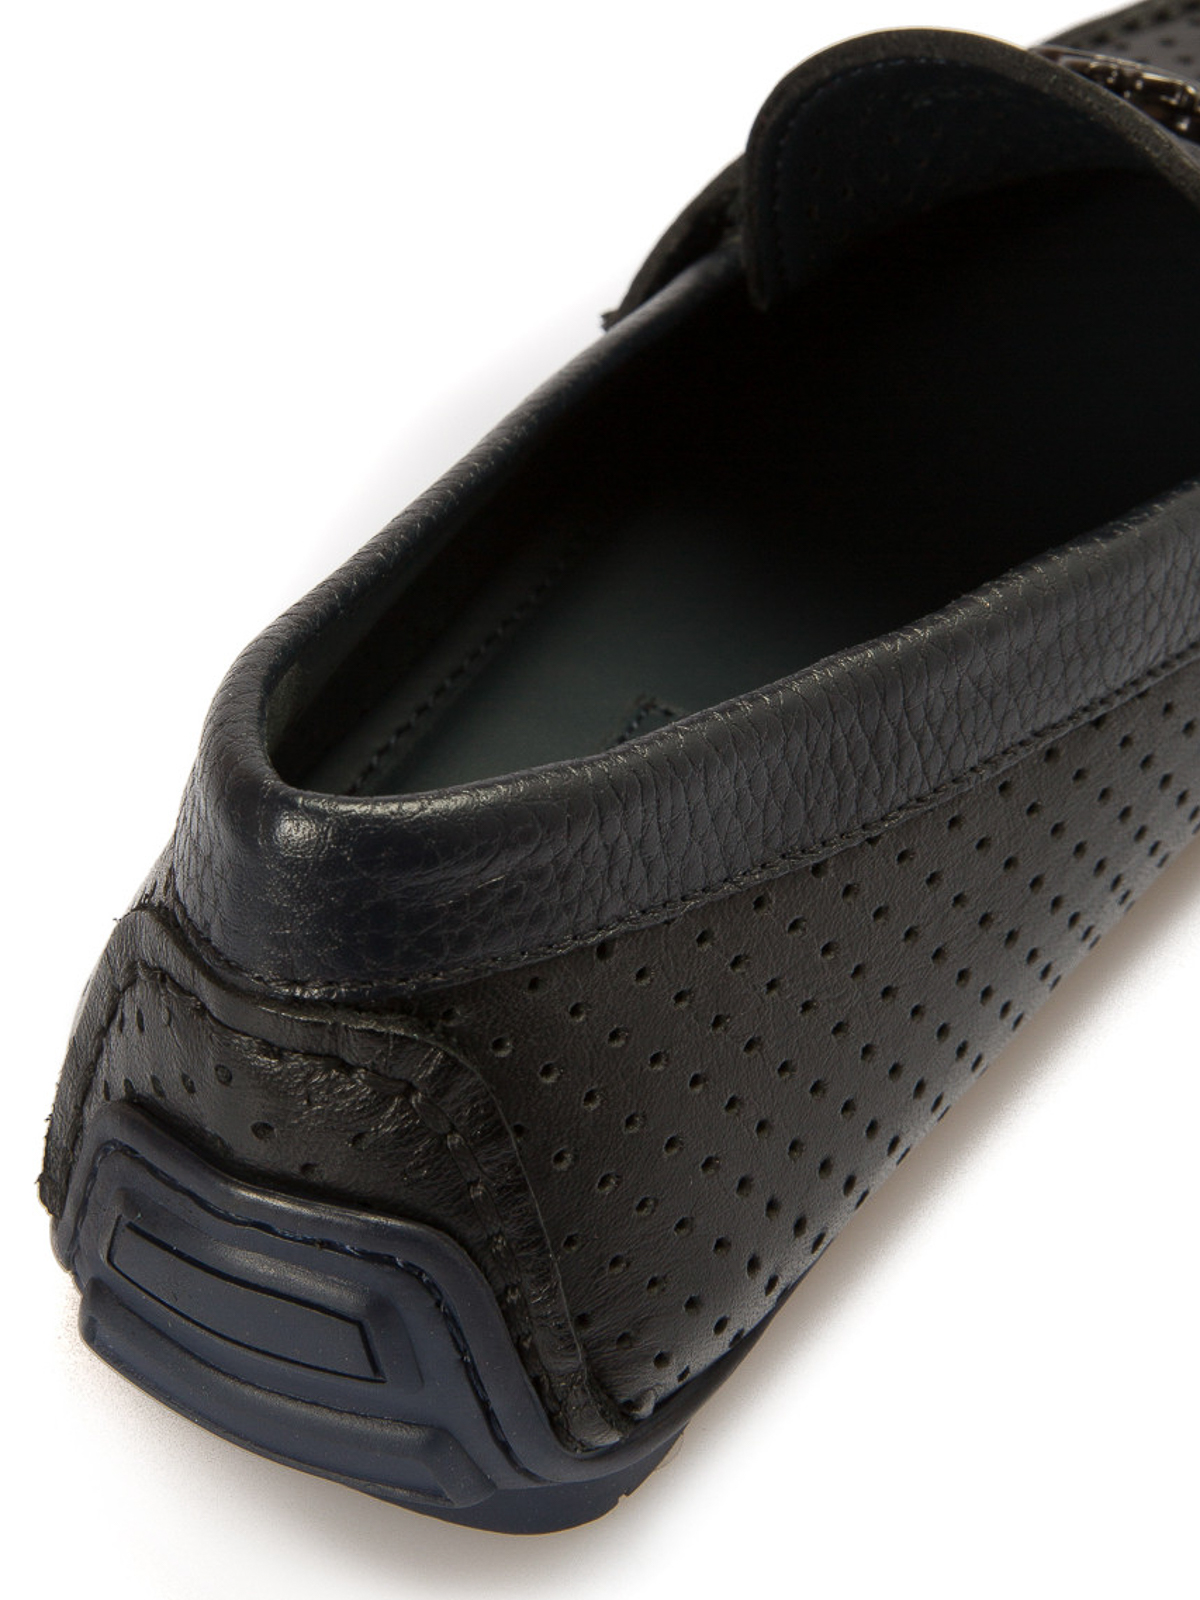 Roberto Cavalli Perforated loafers B3bKf